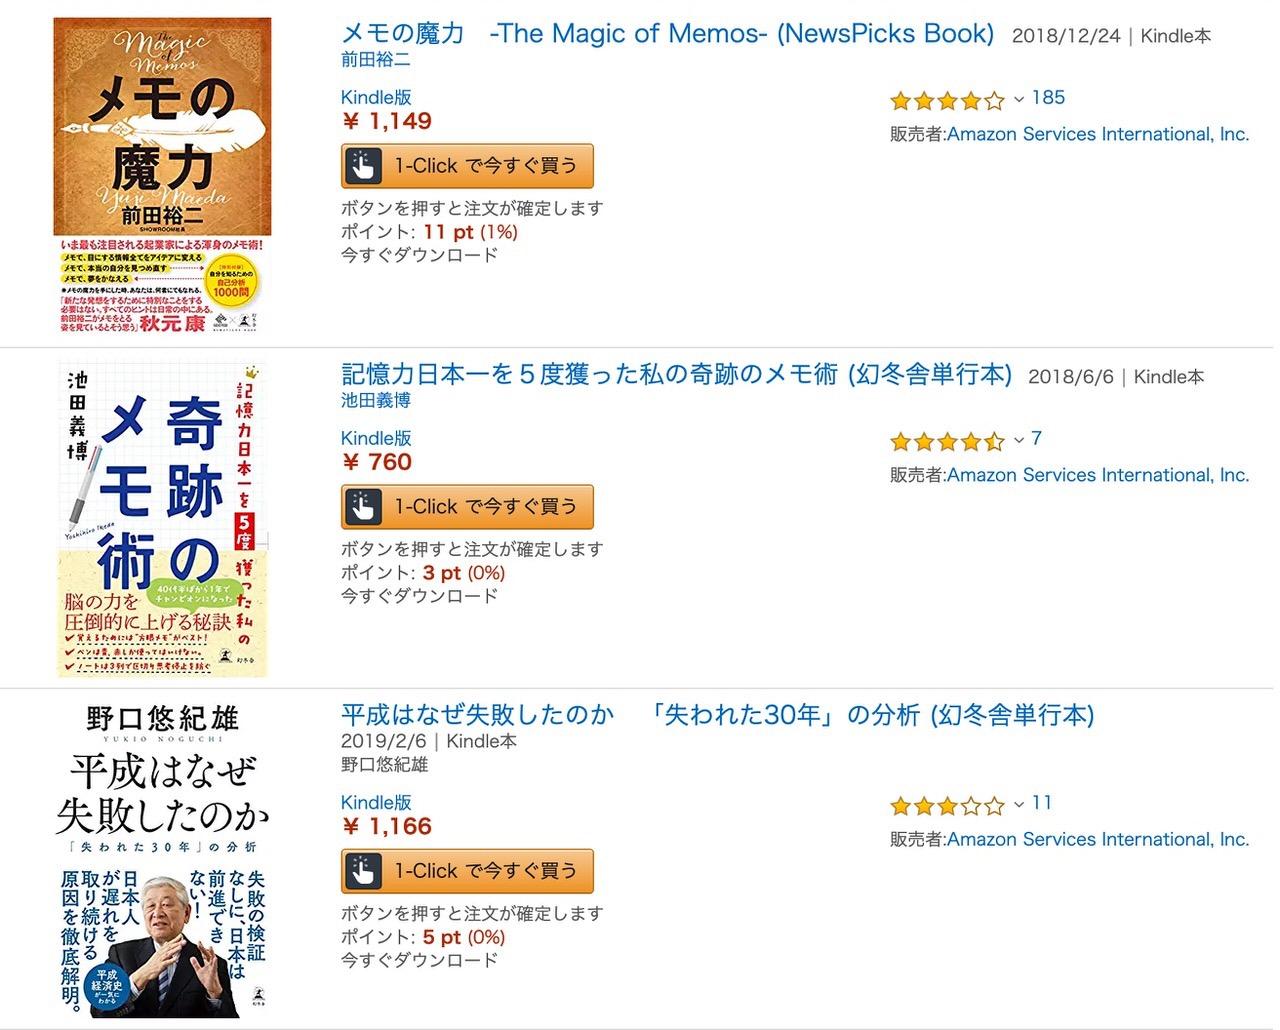 【Kindleセール】幻冬舎の118冊が対象「新リーダーの教科書フェア」開催中(4/18まで)